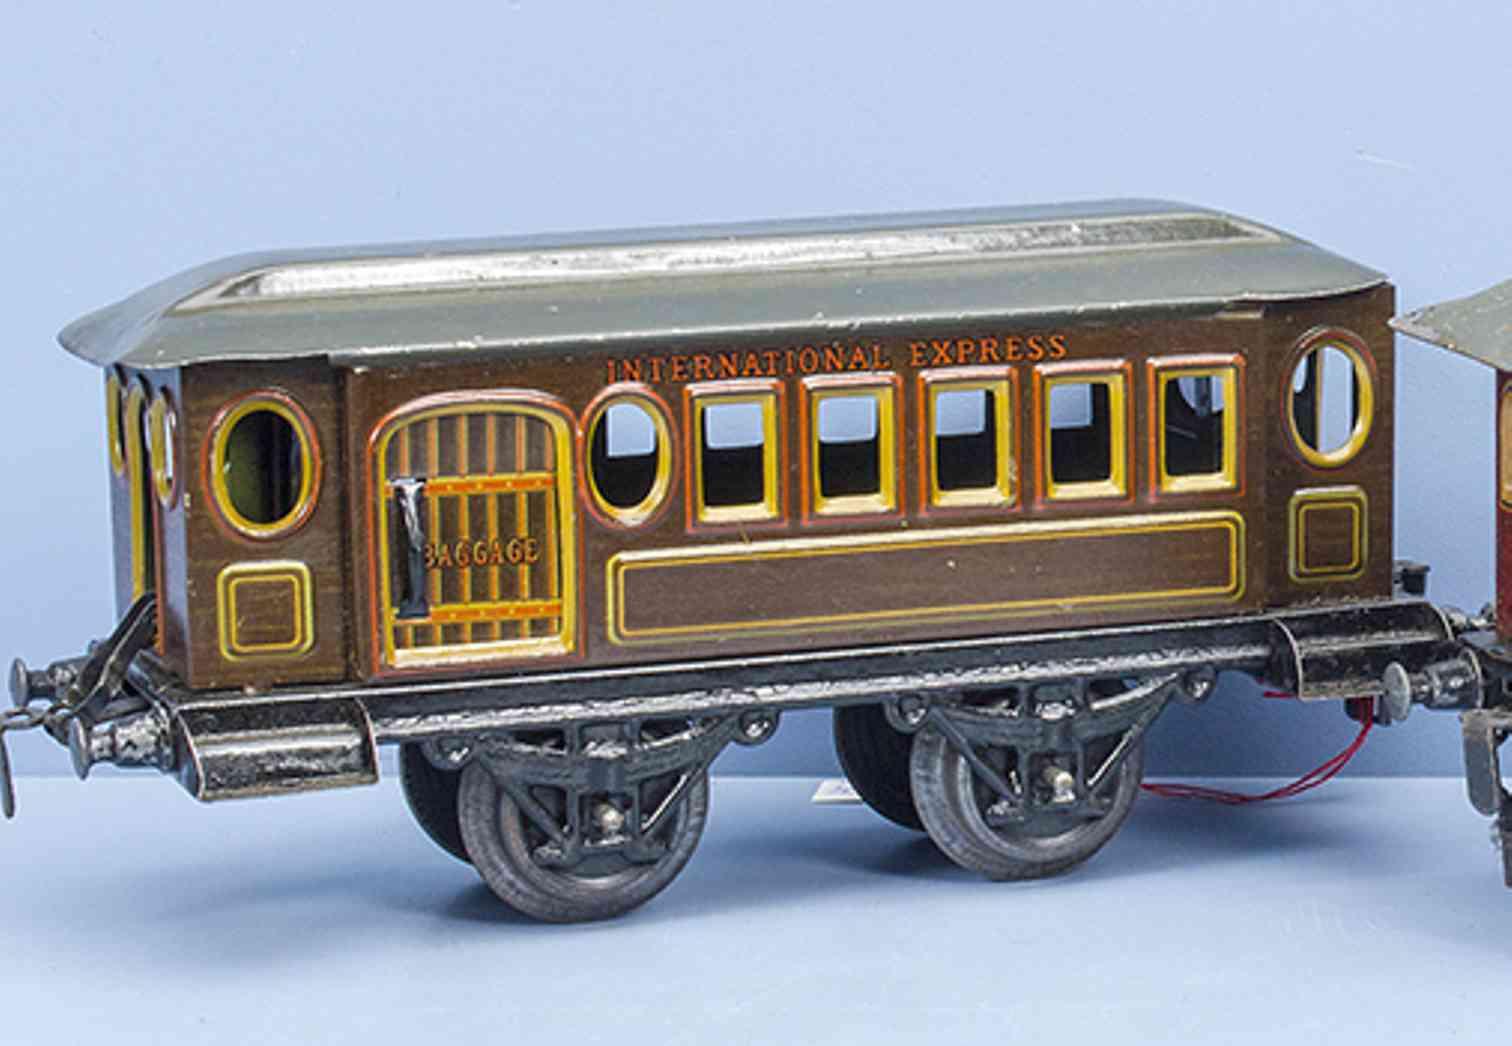 kraus-fandor 1263 spielzeug eisenbahn personen-gepaeckwagen international express spur 1